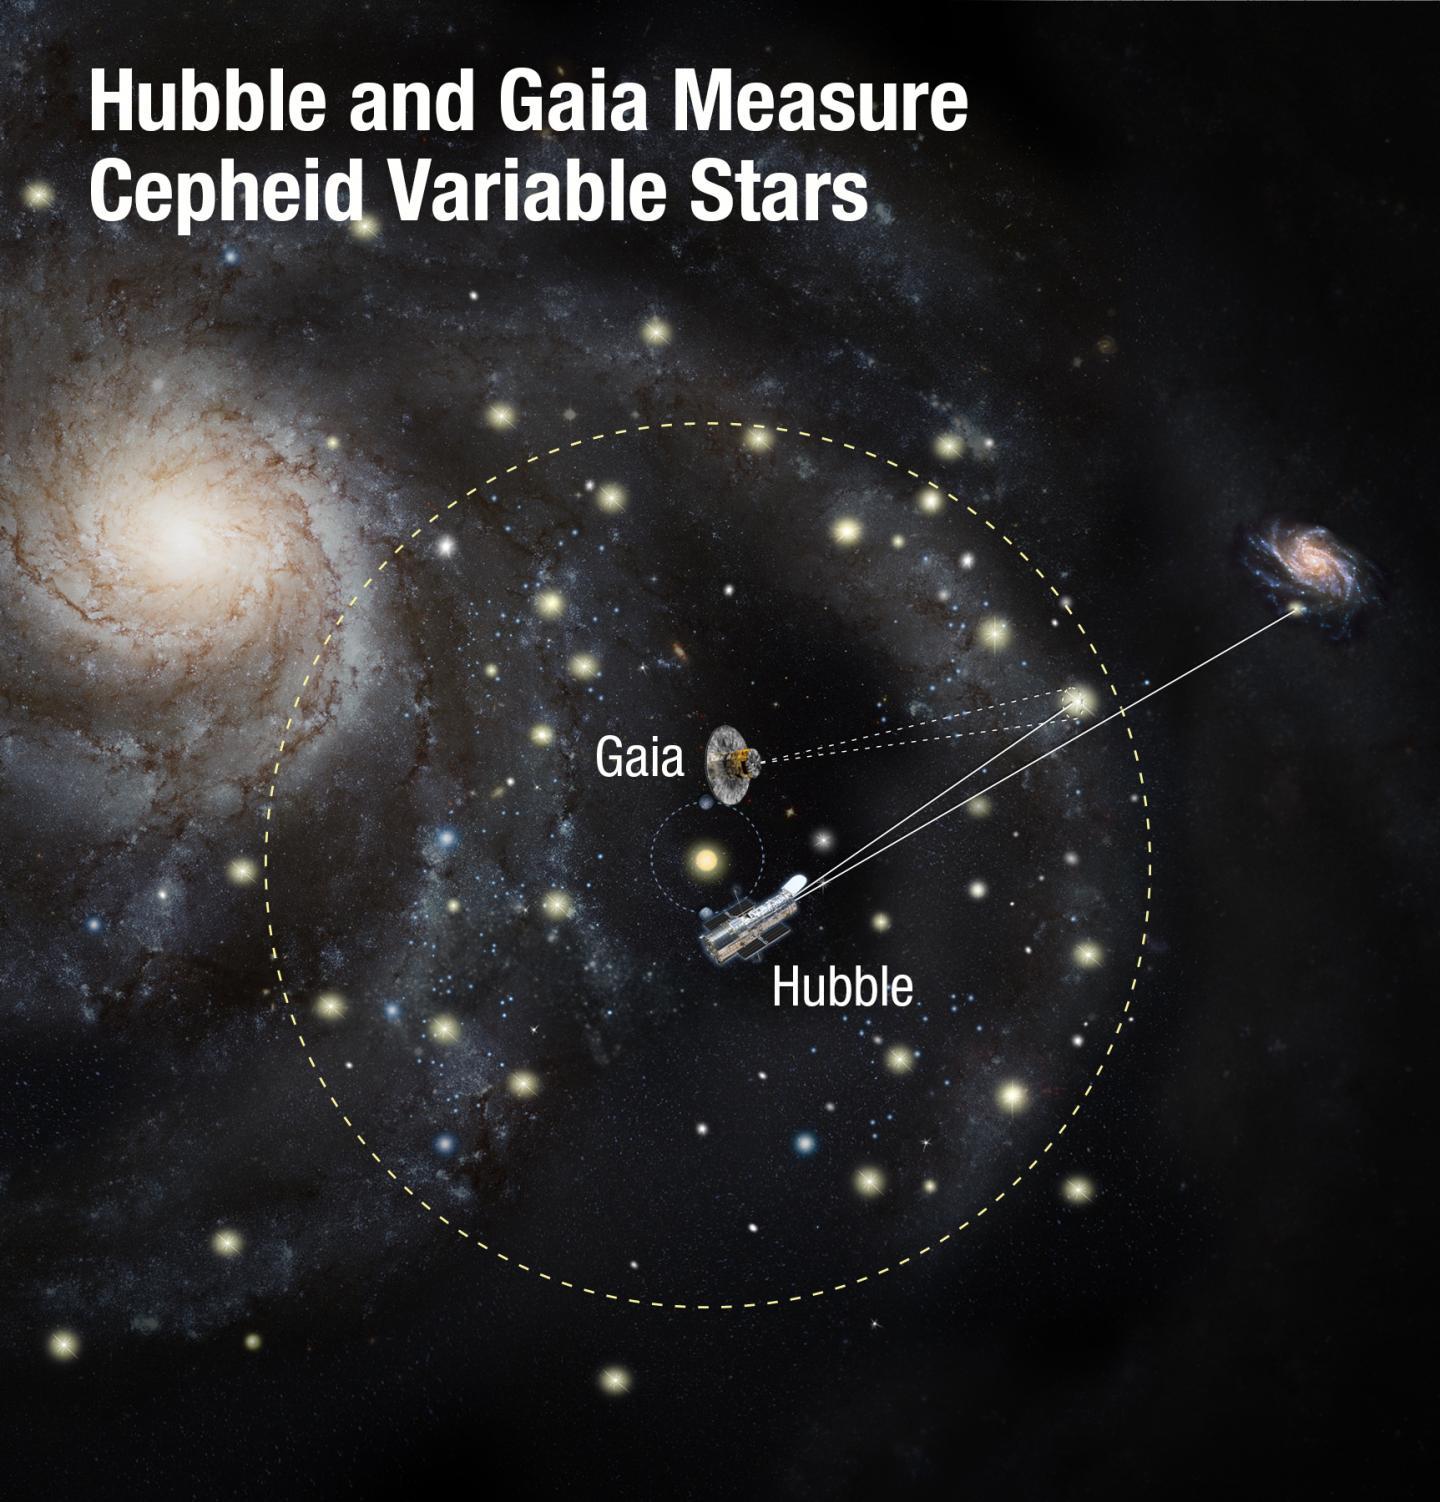 Hubble and Gaia